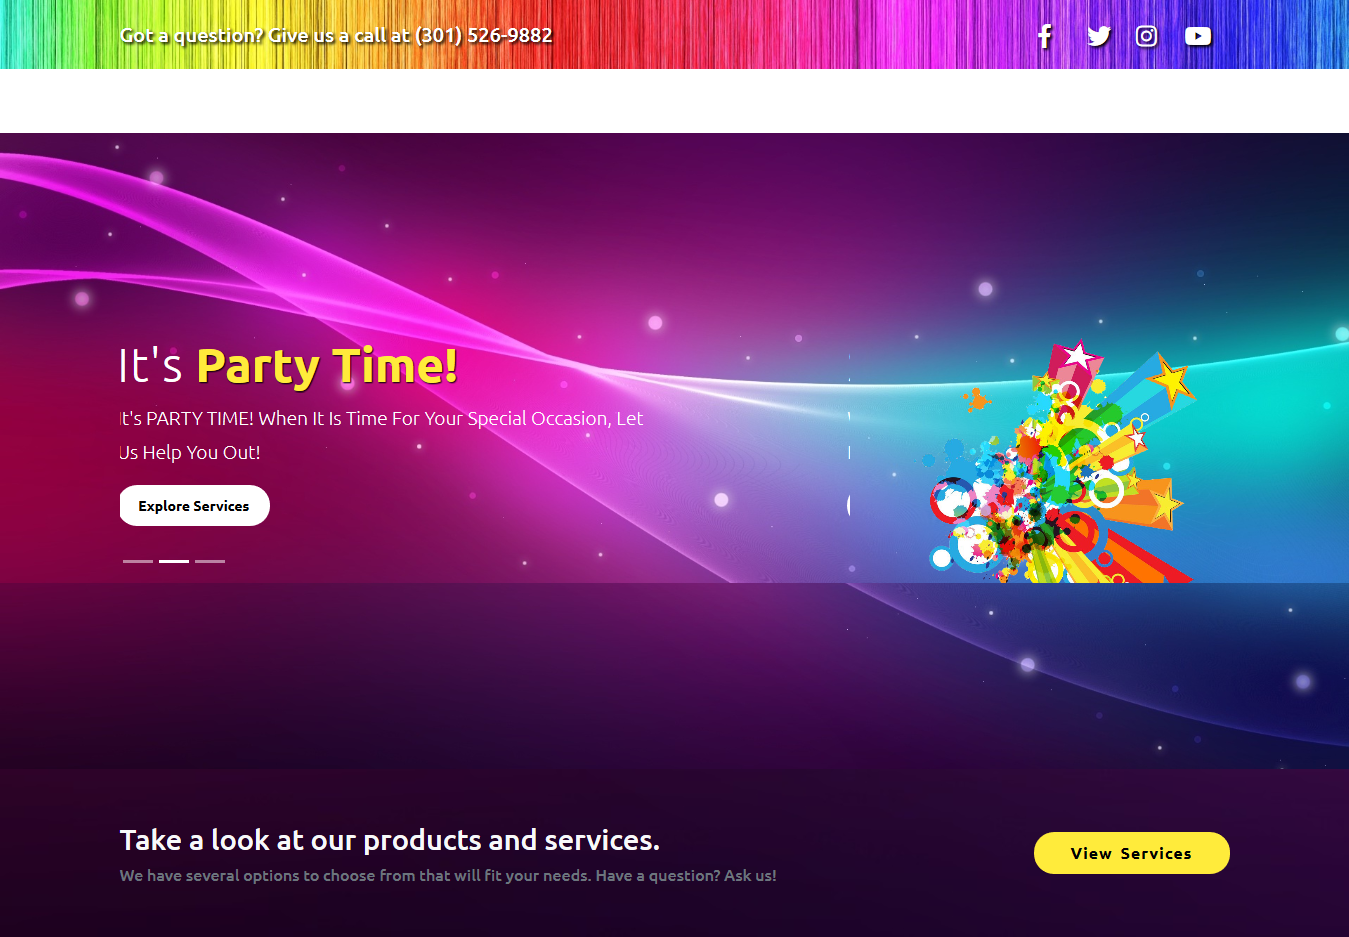 Iz Party Time